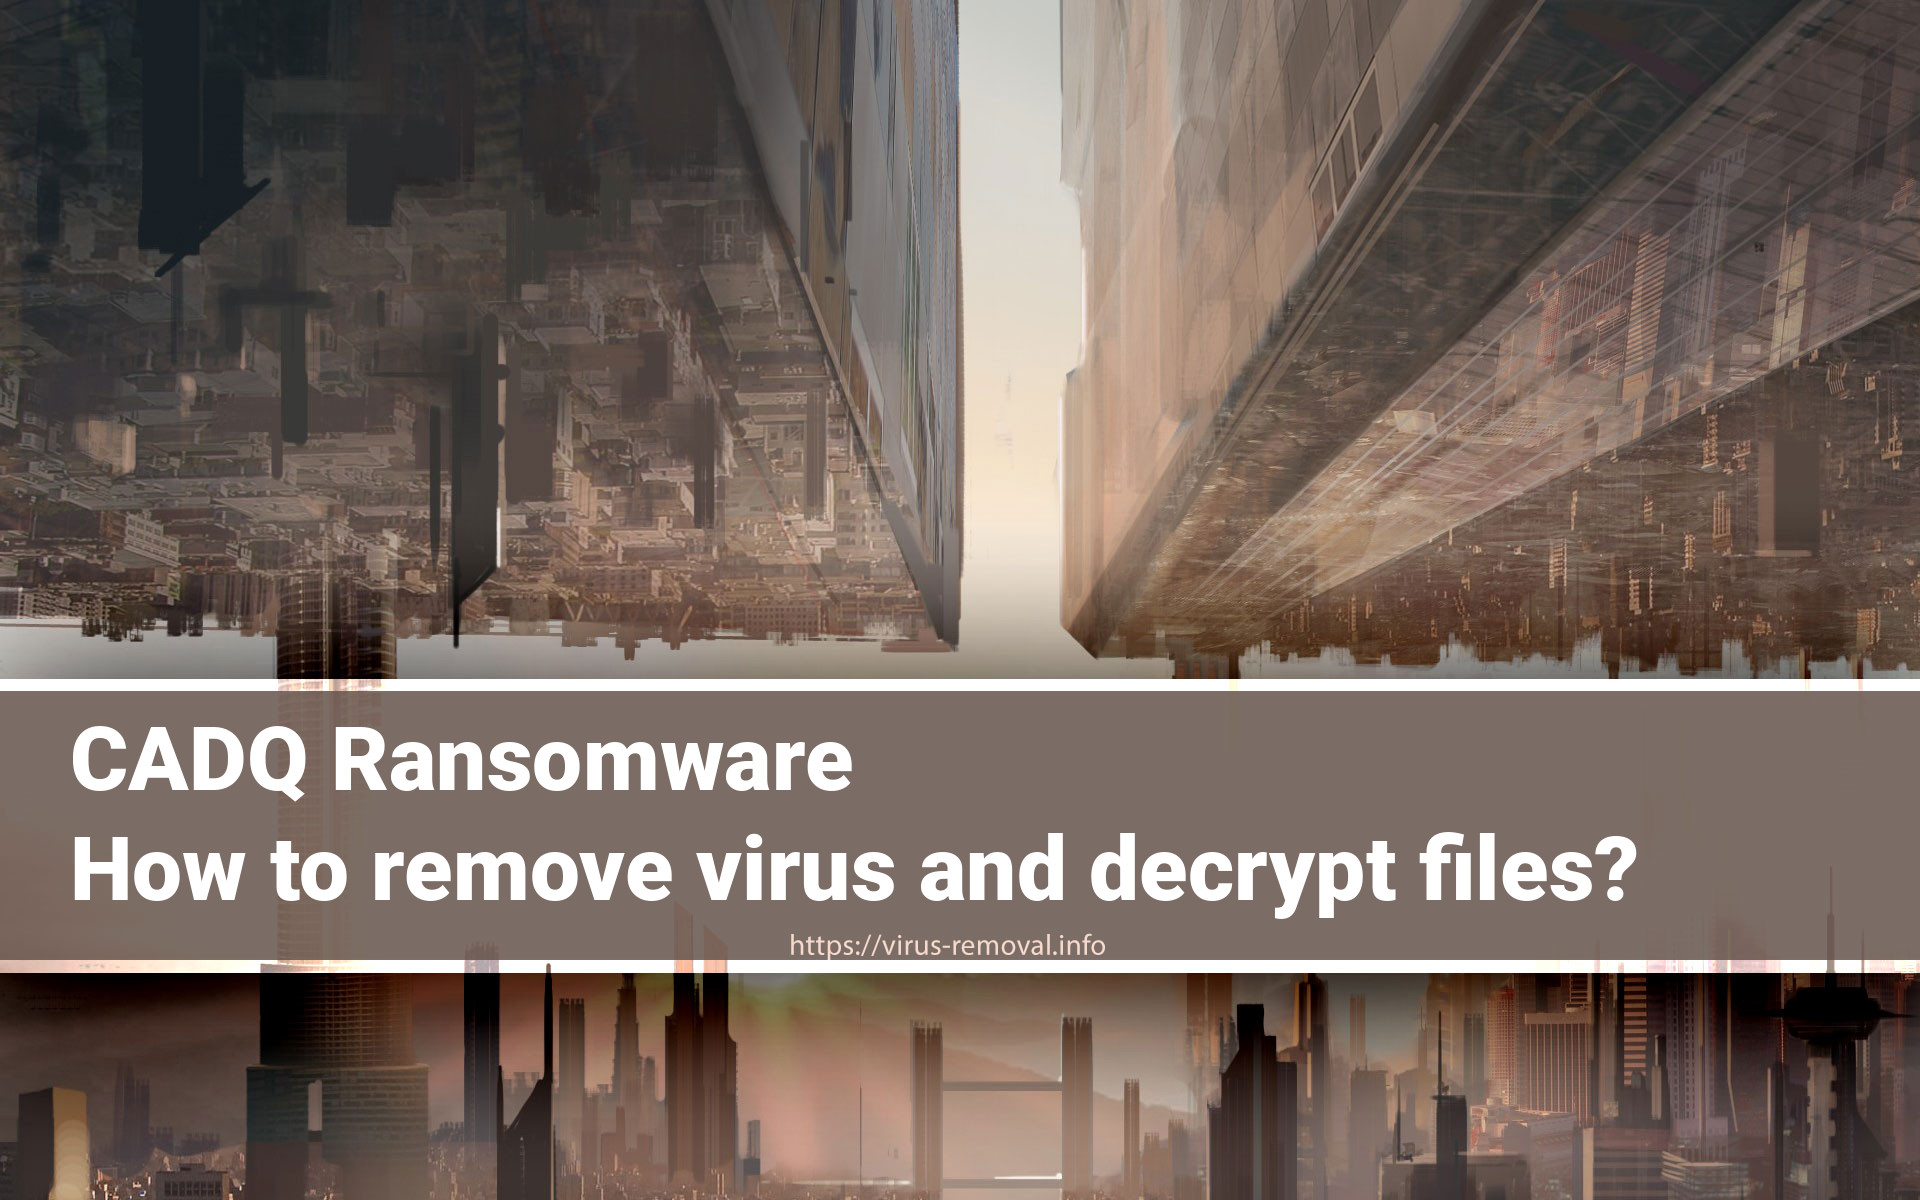 CADQ Ransomware